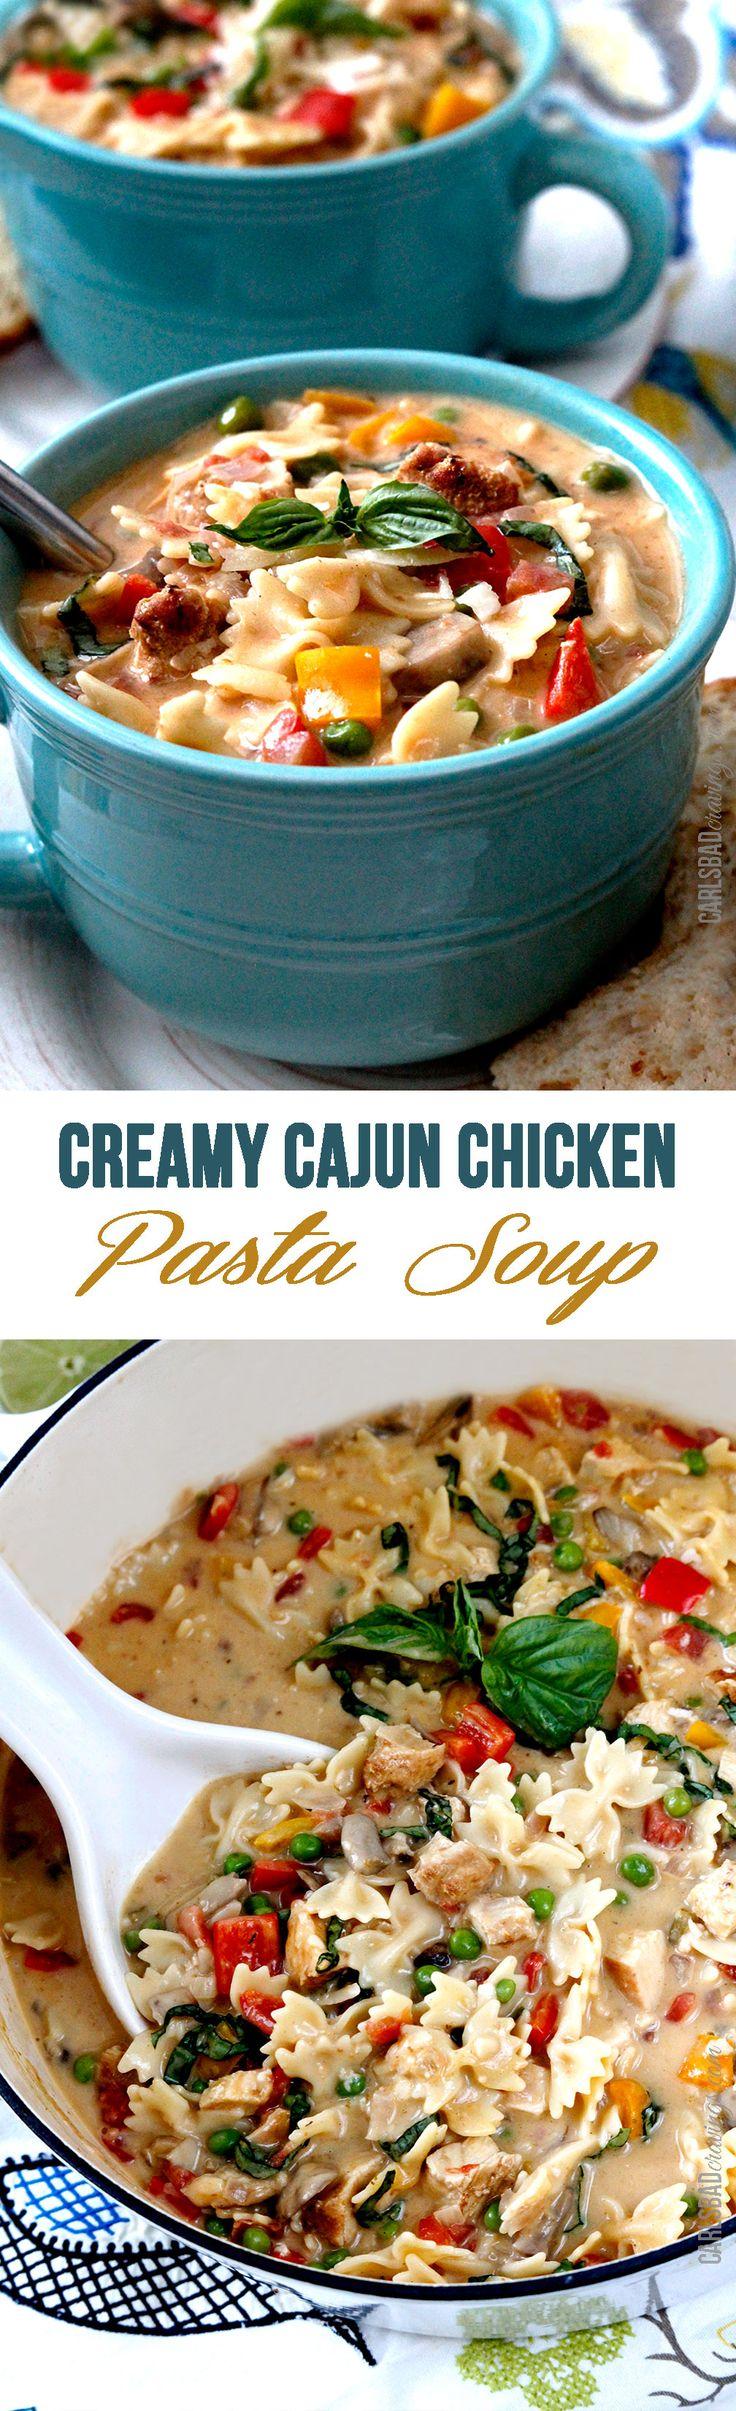 Creamy Cajun Chicken Pasta Soup - Everything you love about Cajun Chicken Pasta - but in an incredible creamy broth! #soup #cajun #pasta